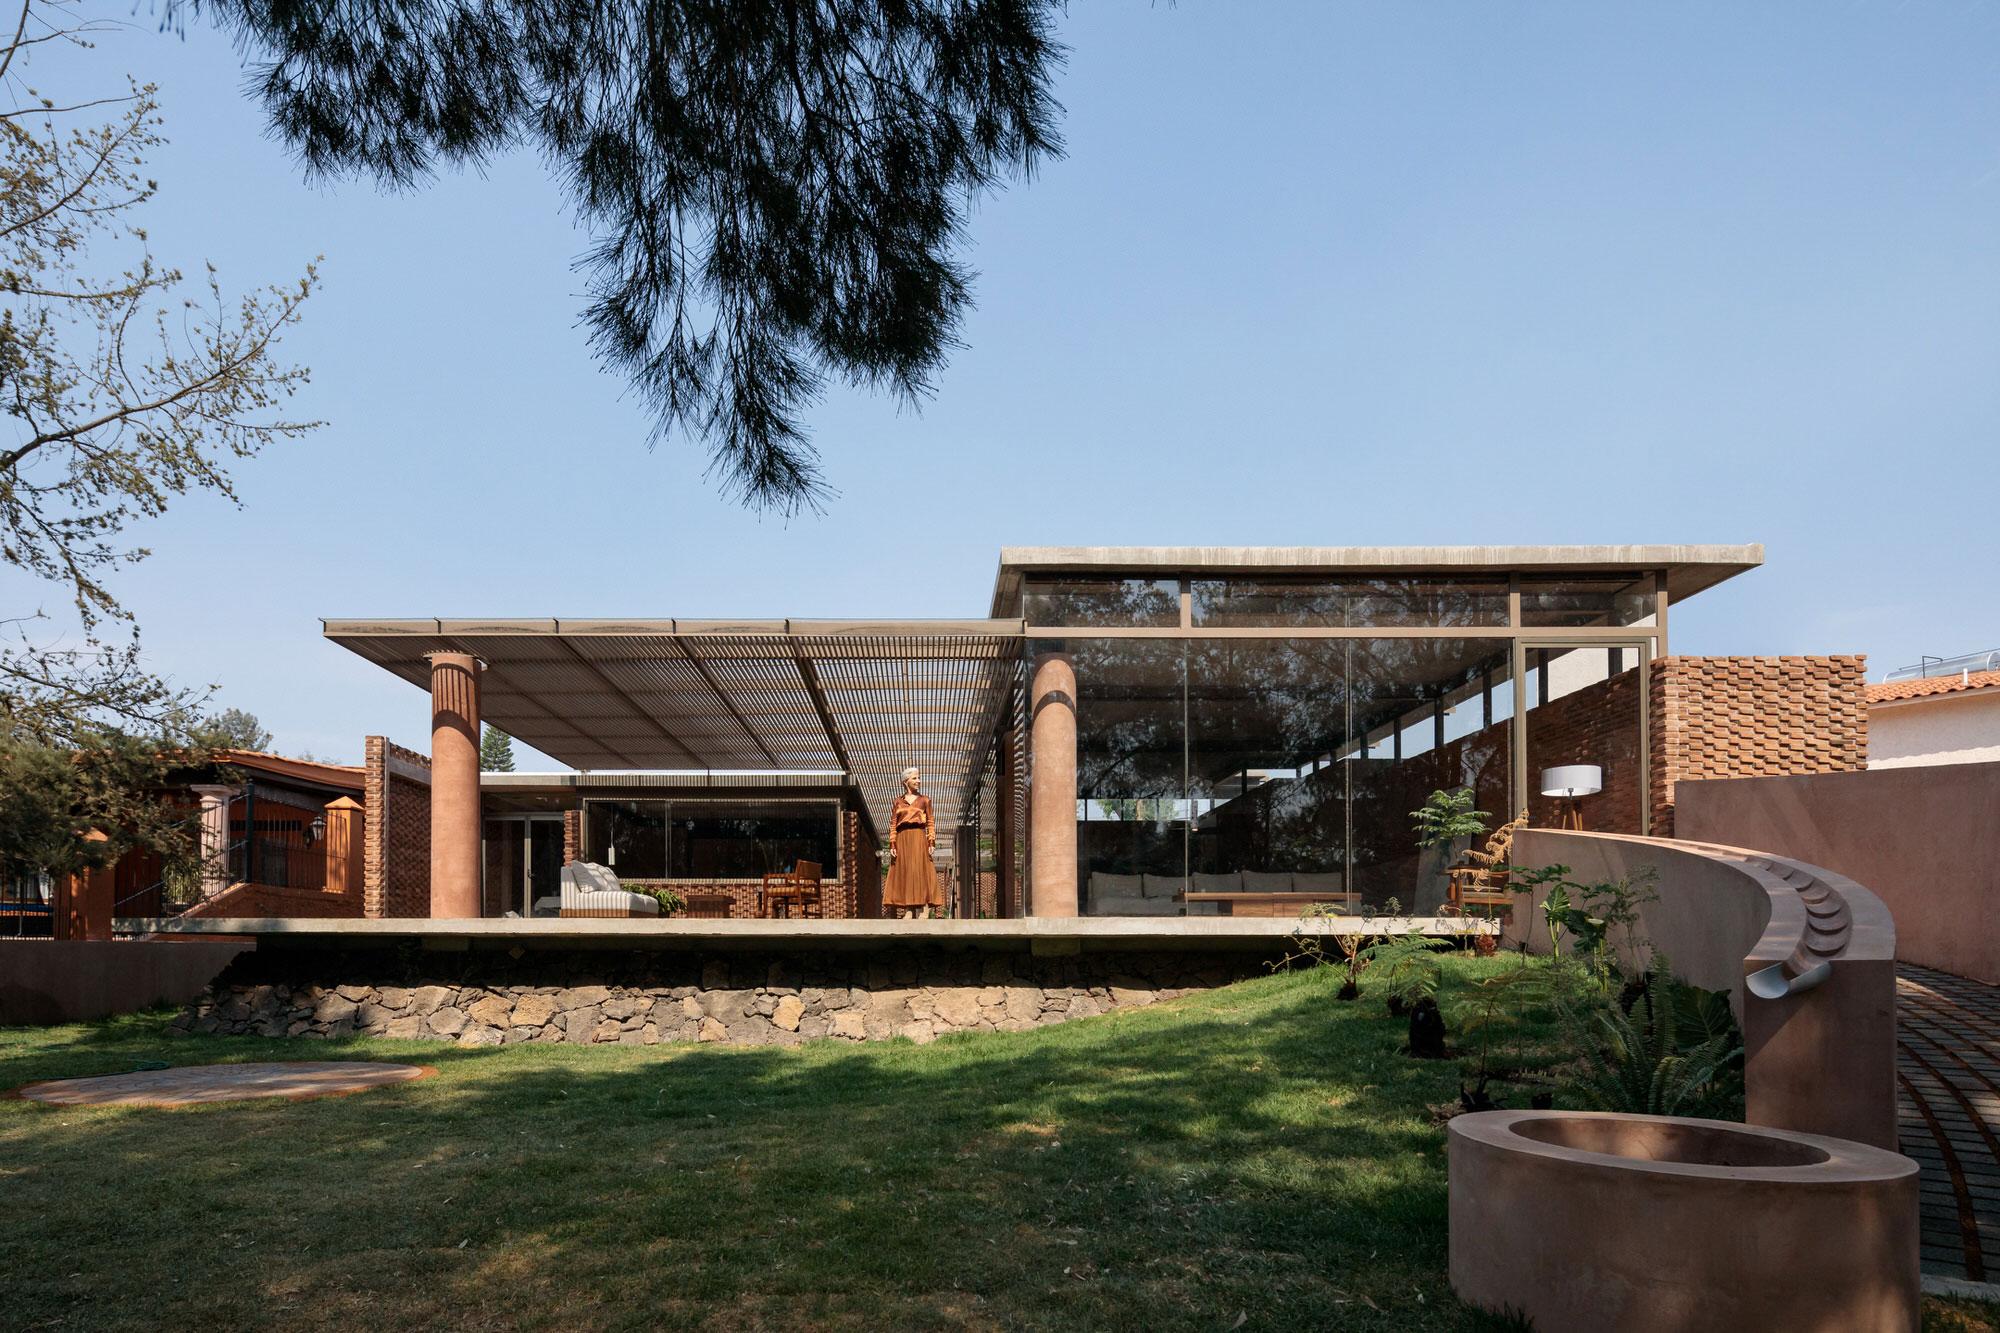 Daniela Bucio Sistos Uc House Morelia Mexico Brick Architecture Photo Dane Alonso Yellowtrace 21